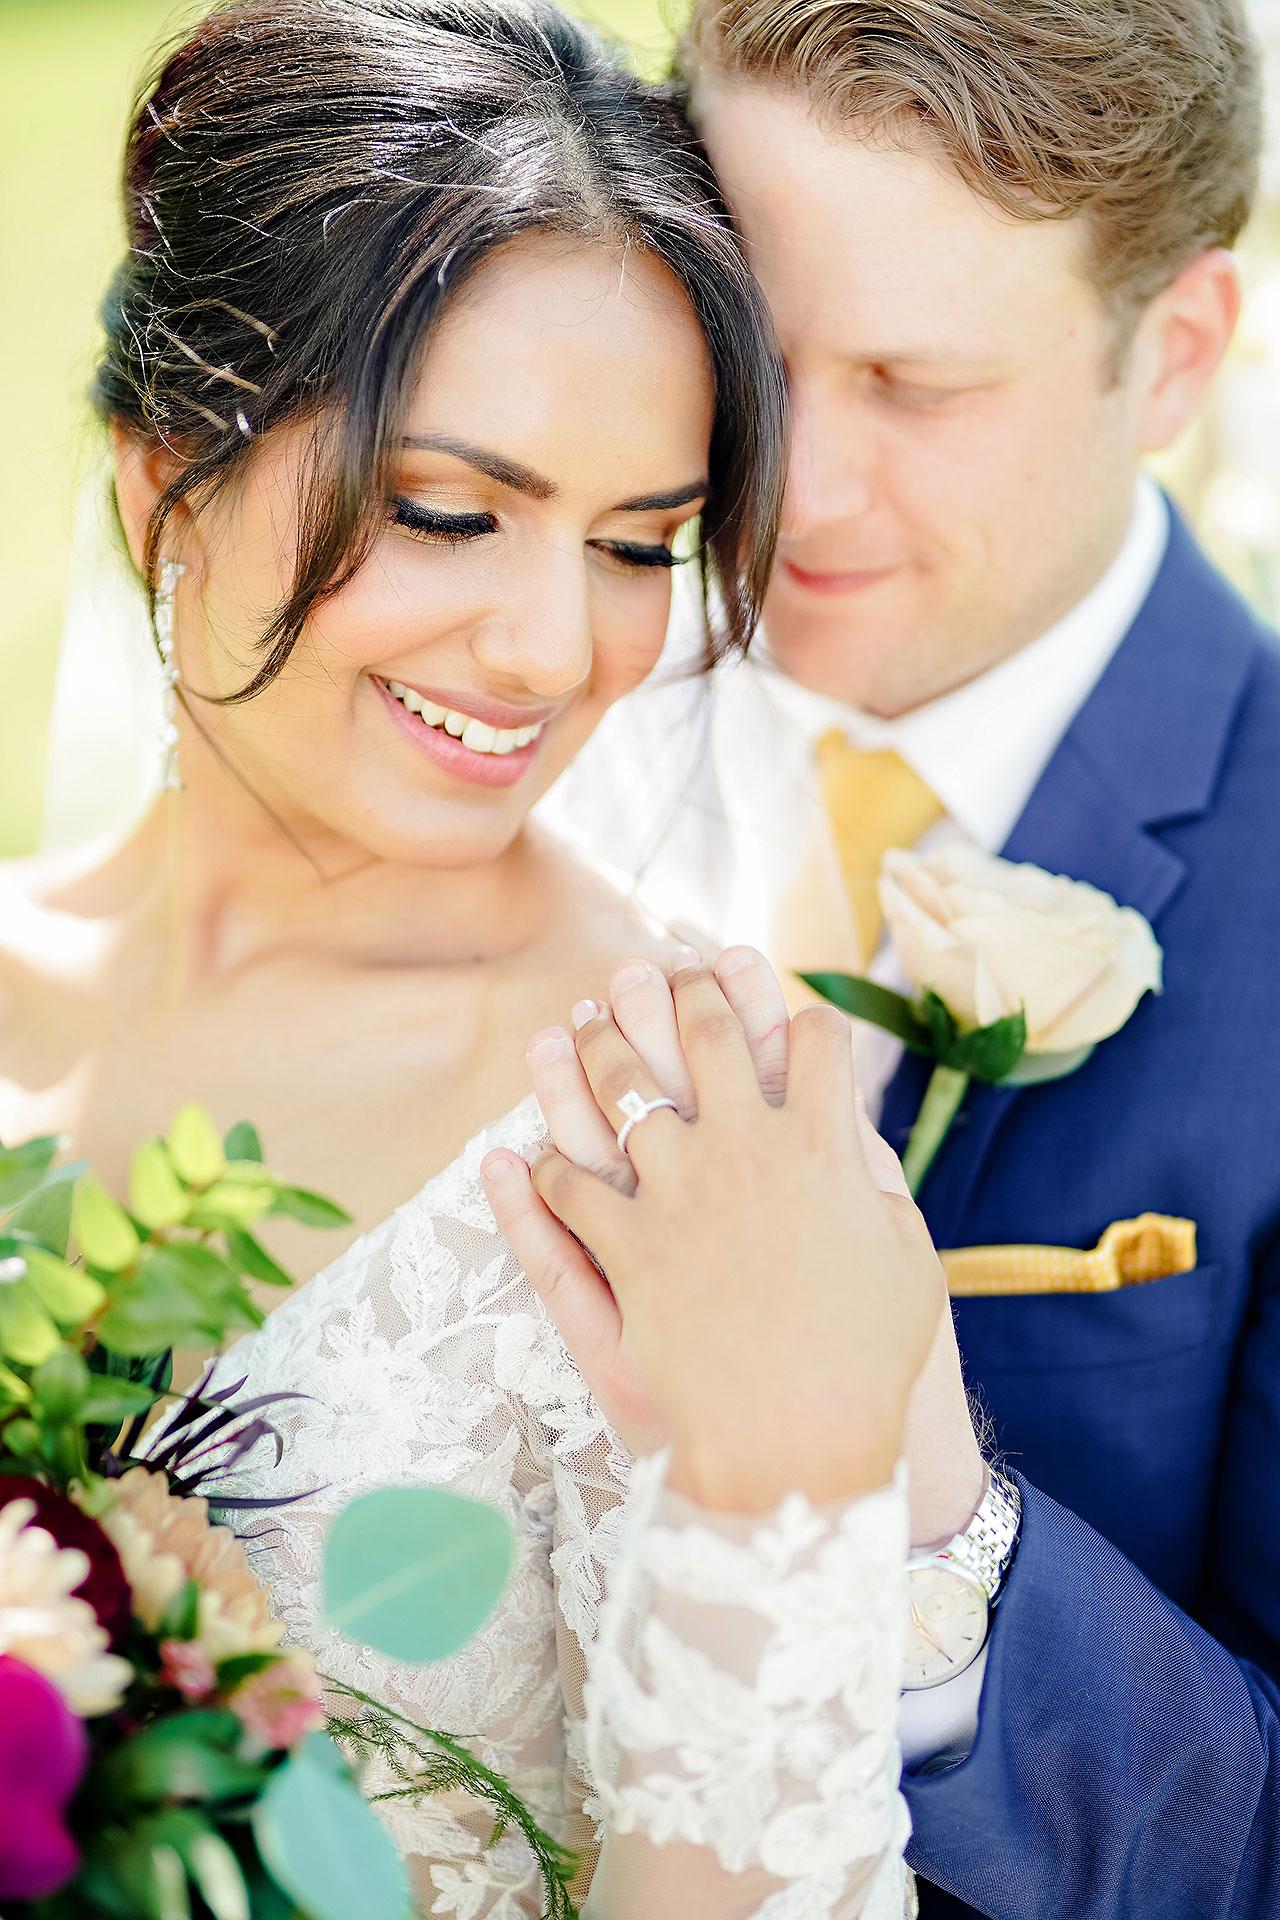 Nadia Parker Black Iris Estate Carmel Indiana Wedding May 2021 069